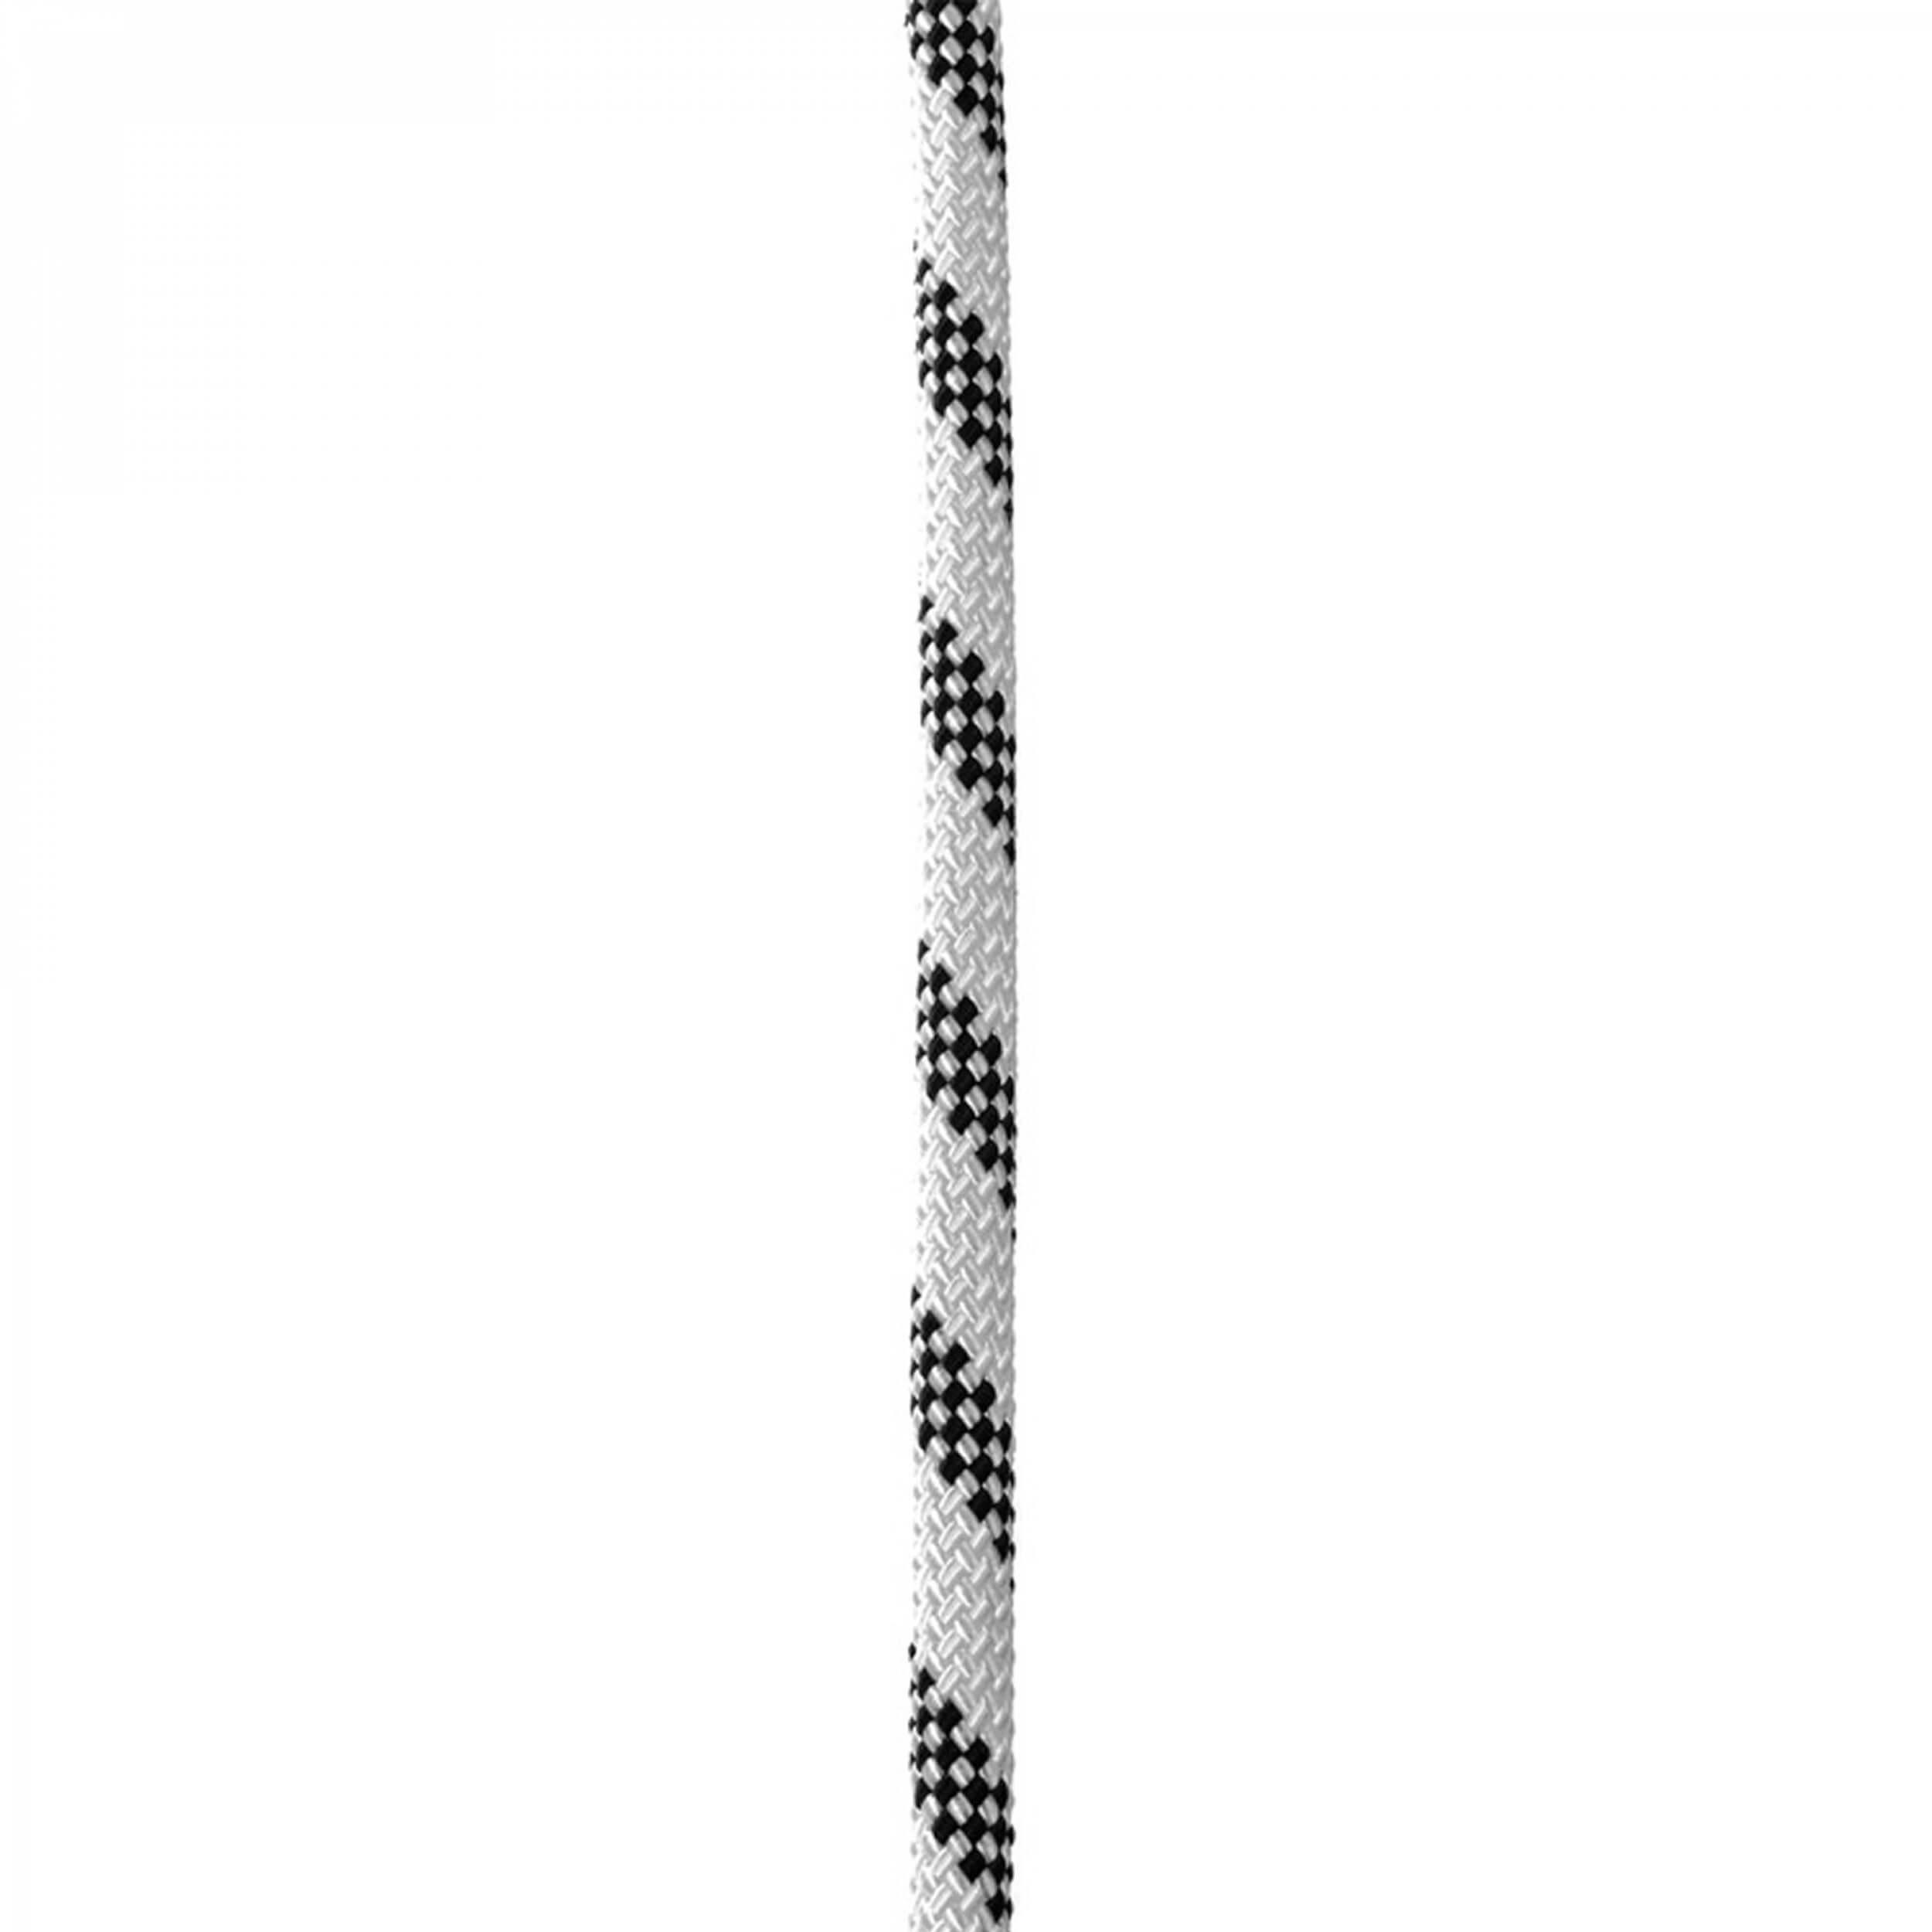 Edelrid Performance Static 12mm